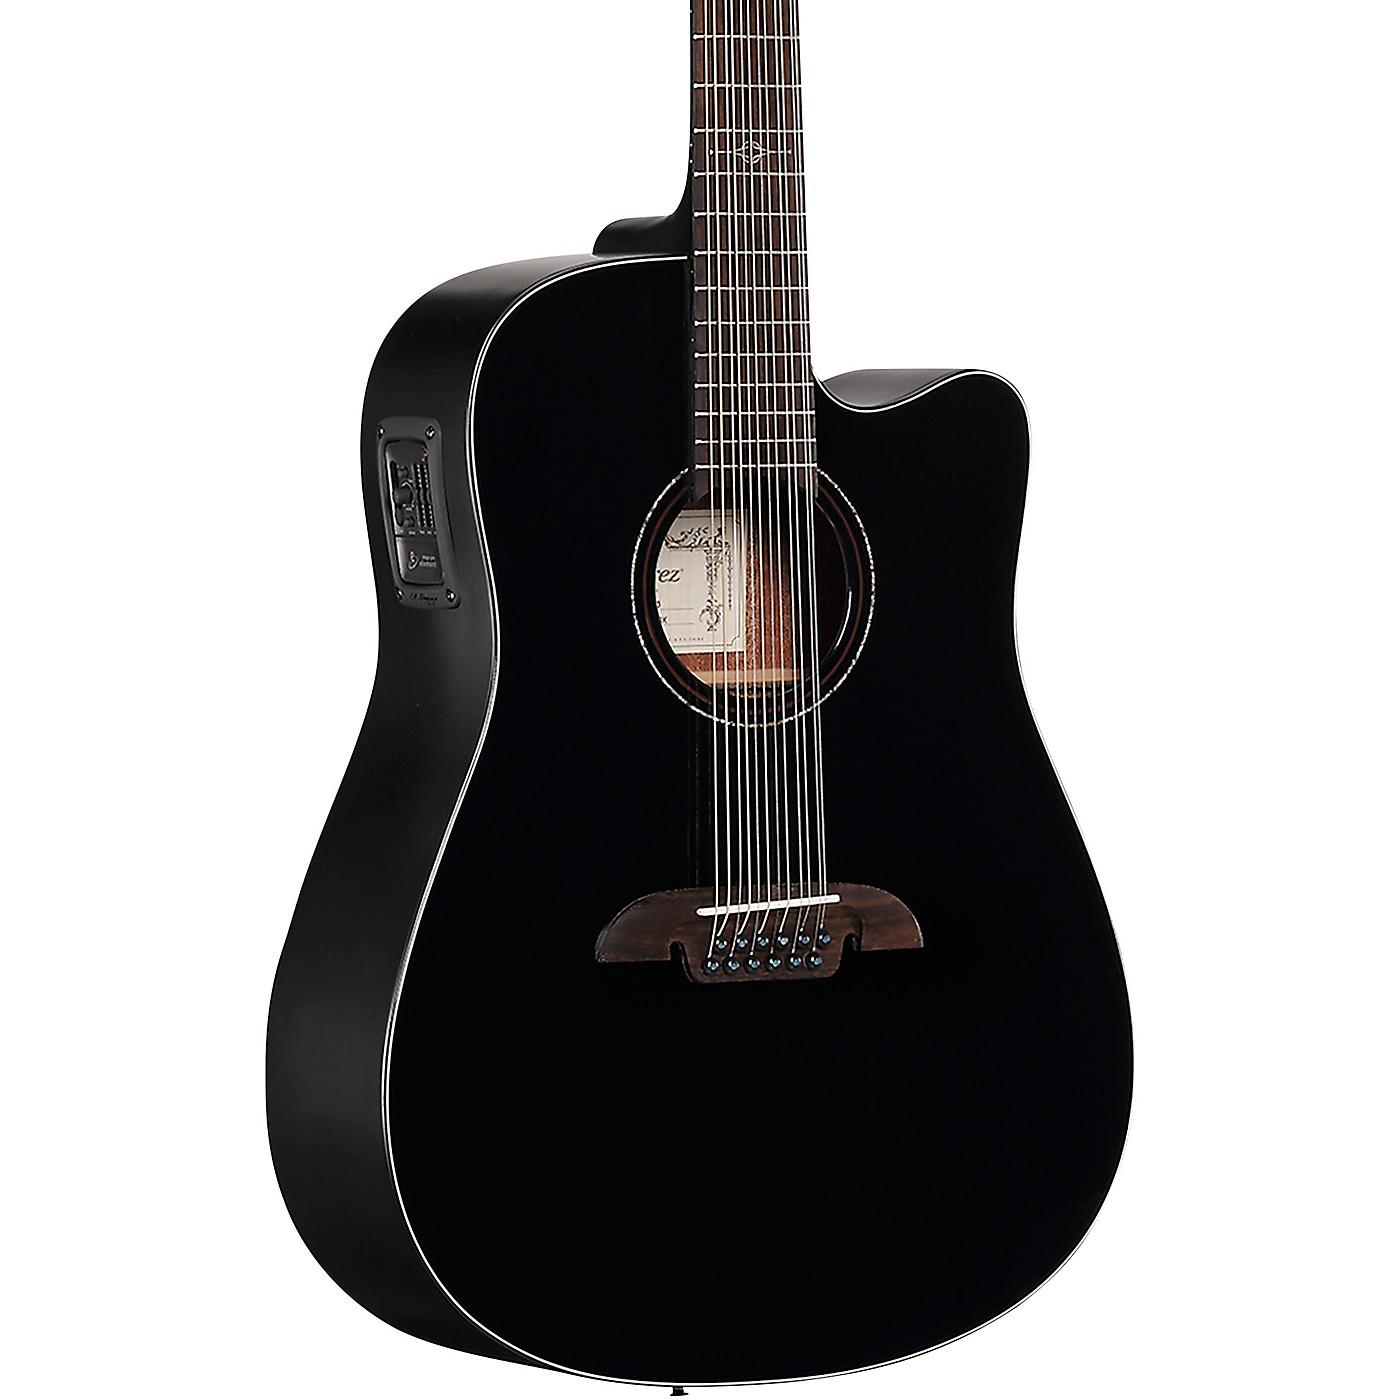 Alvarez AD60 Artist Series 12-String Dreadnought Acoustic-Electric Guitar thumbnail